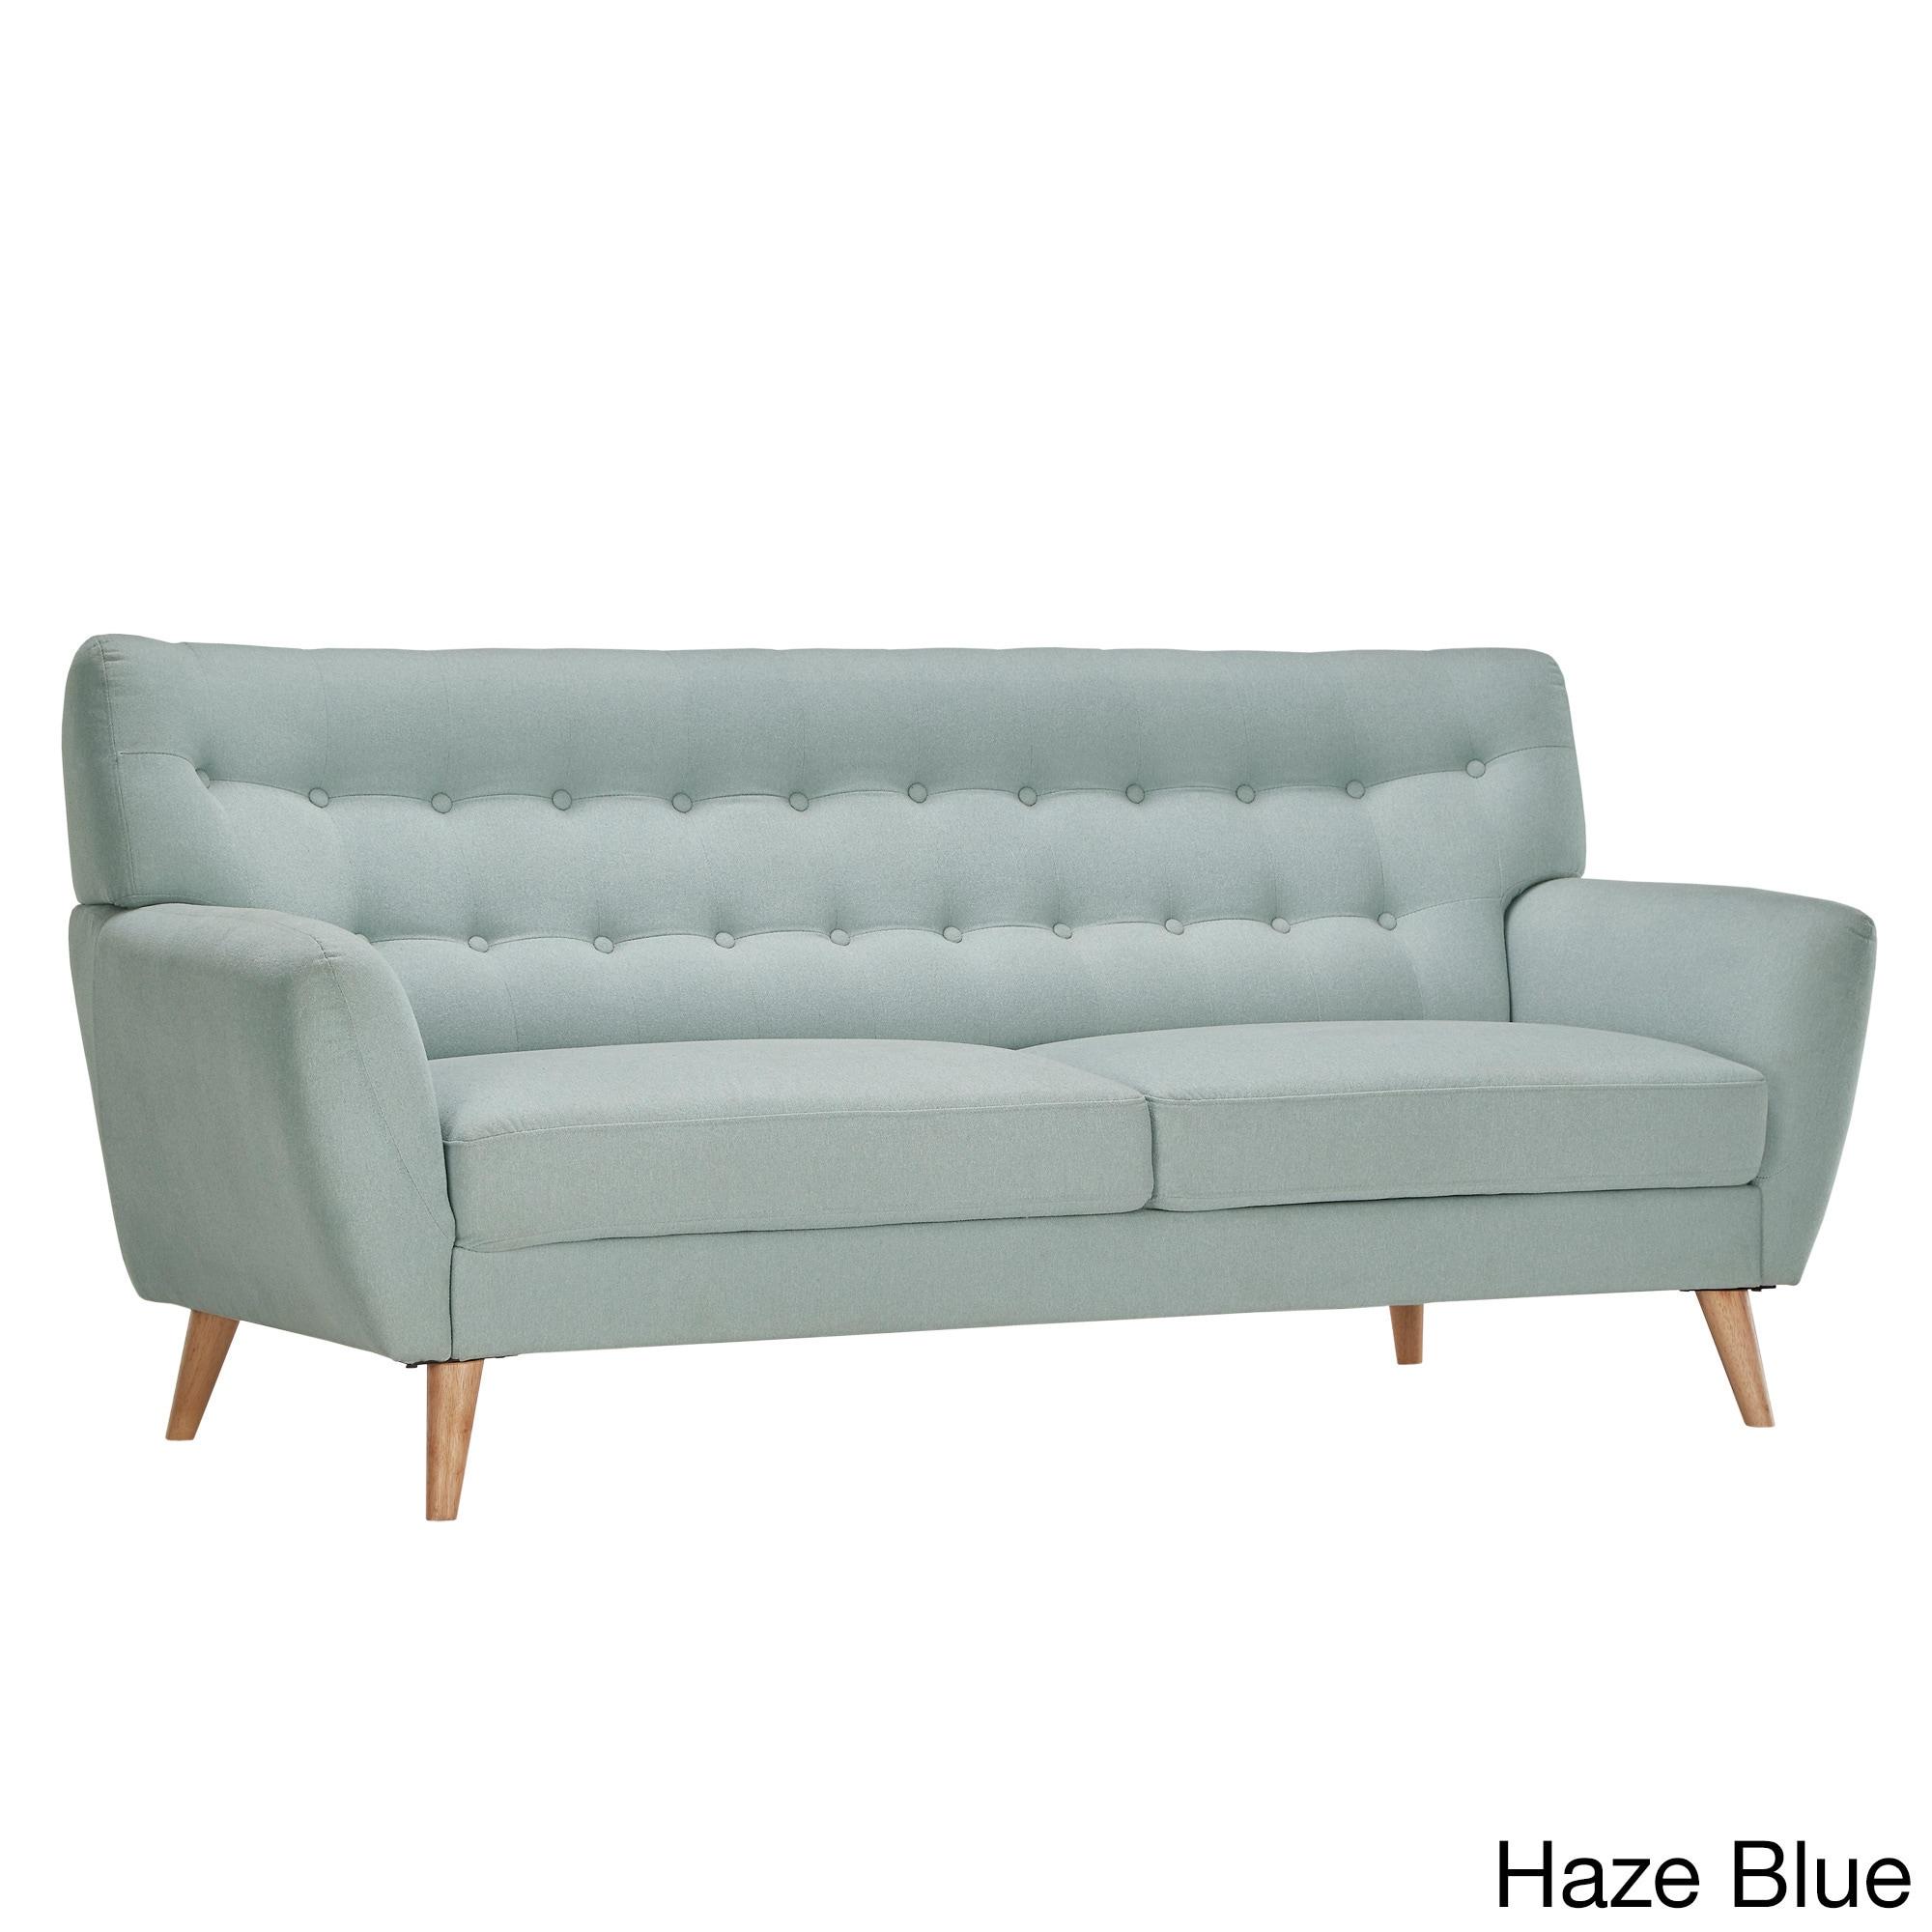 Niels Danish Modern Button Tufted Linen Fabric Sofa iNSPI...